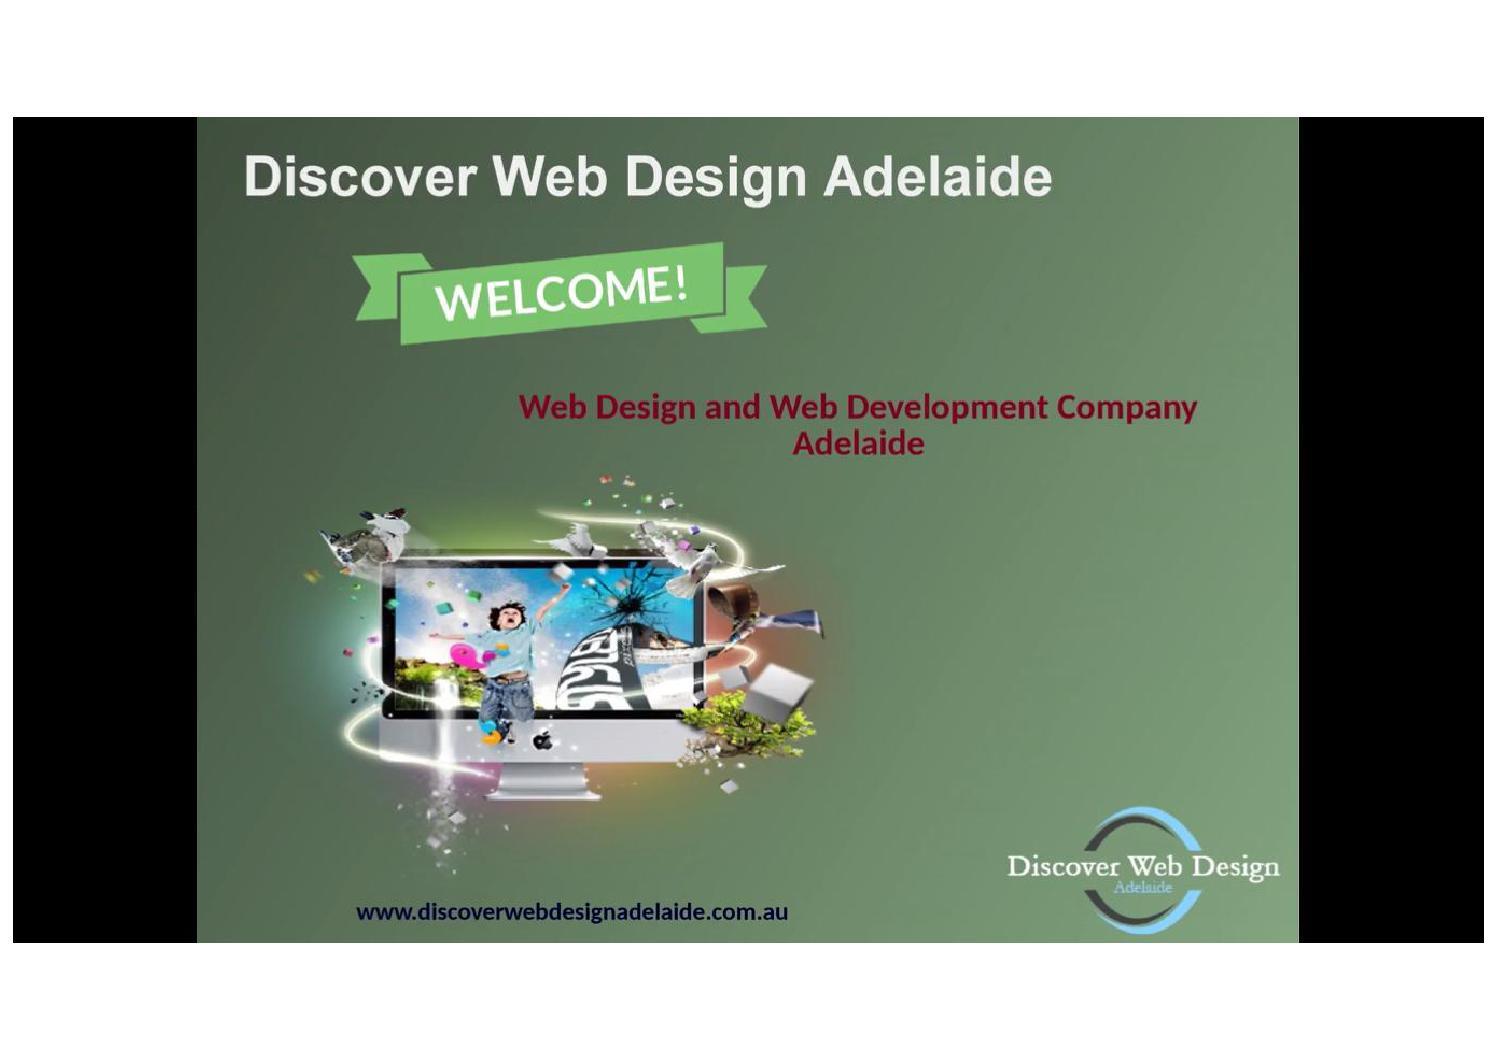 Web design adelaide provides responsive web design for Adelaide design